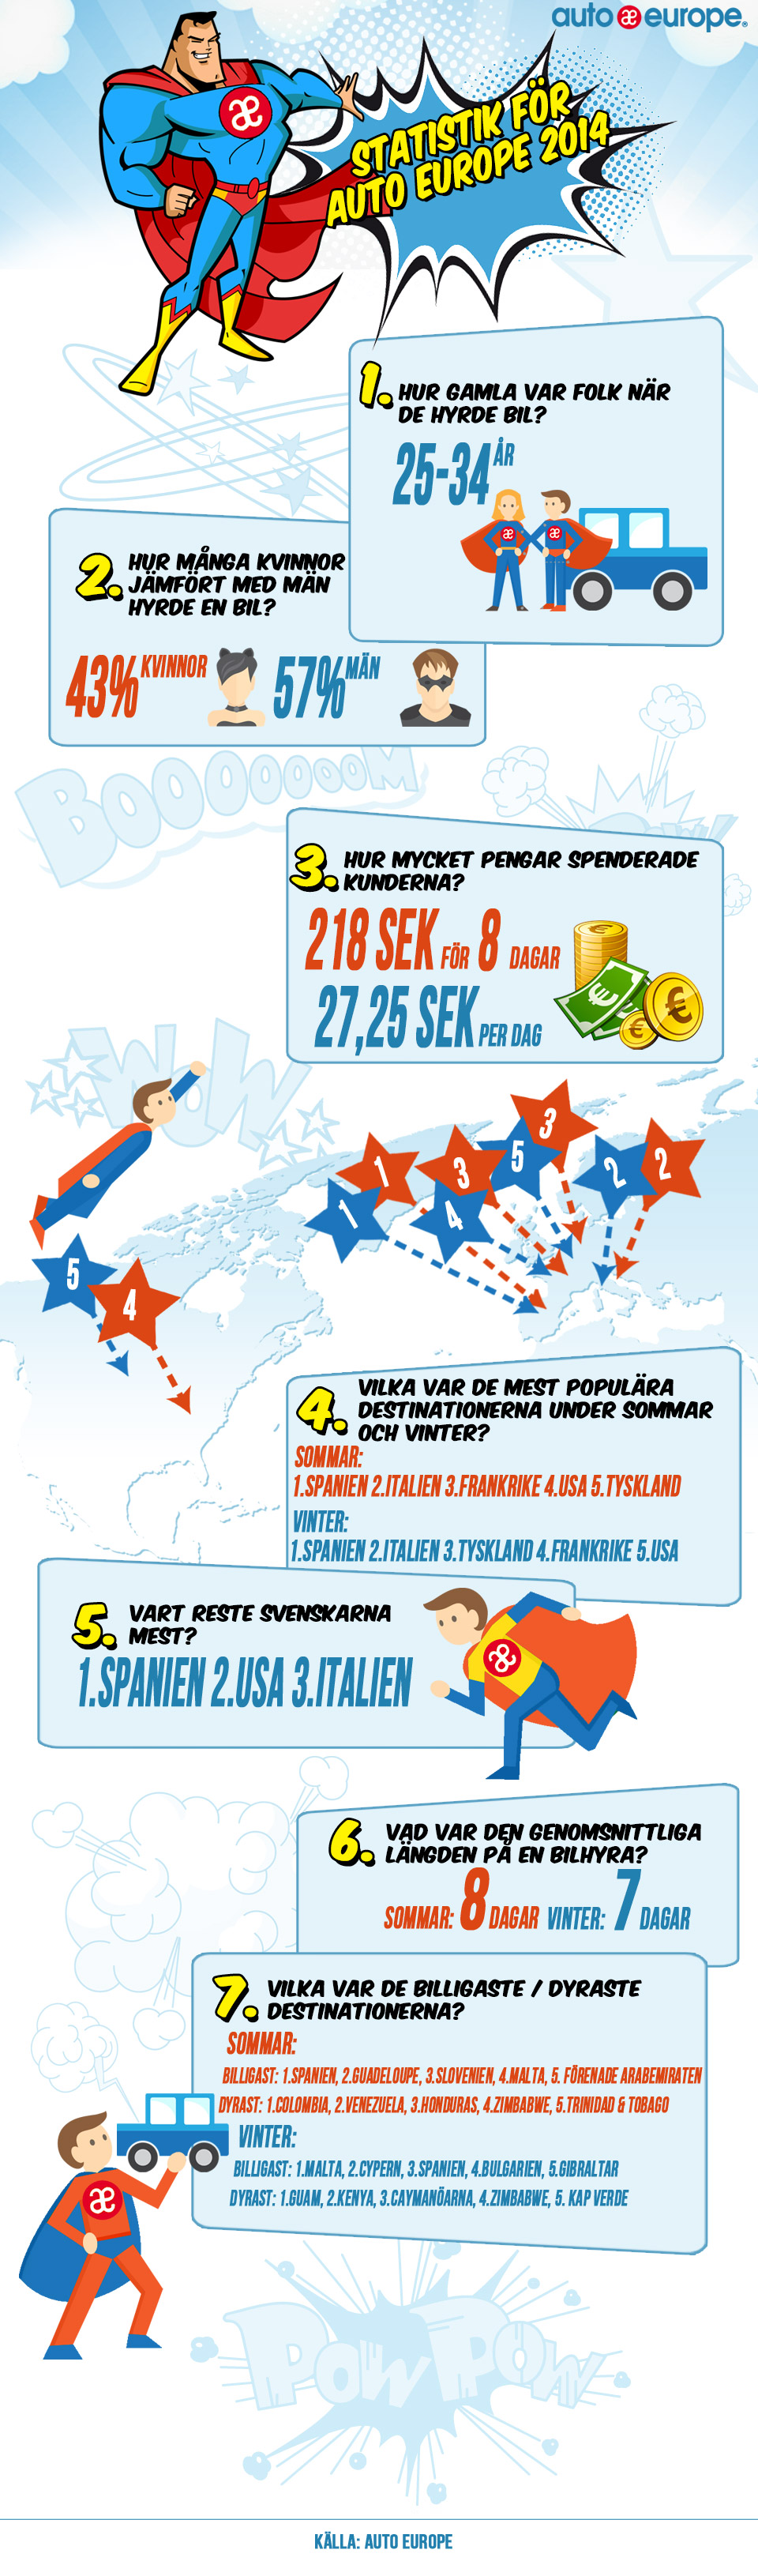 Auto Europe statistisk